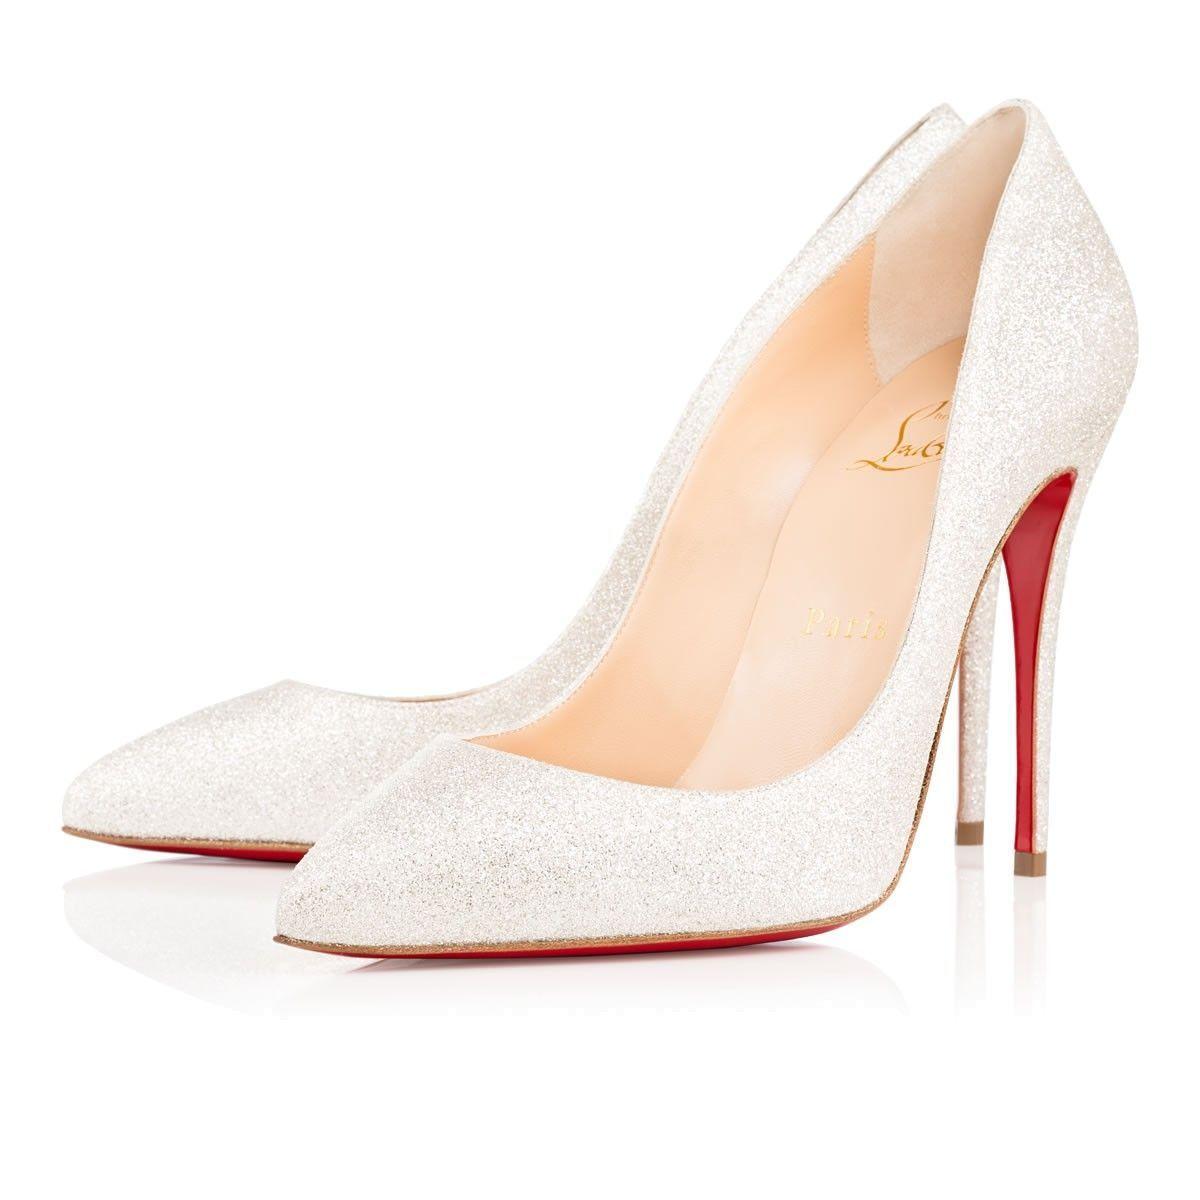 206ac09fe93 Pigalle Follies 100 Ivory Glitter - Women Shoes - Christian ...